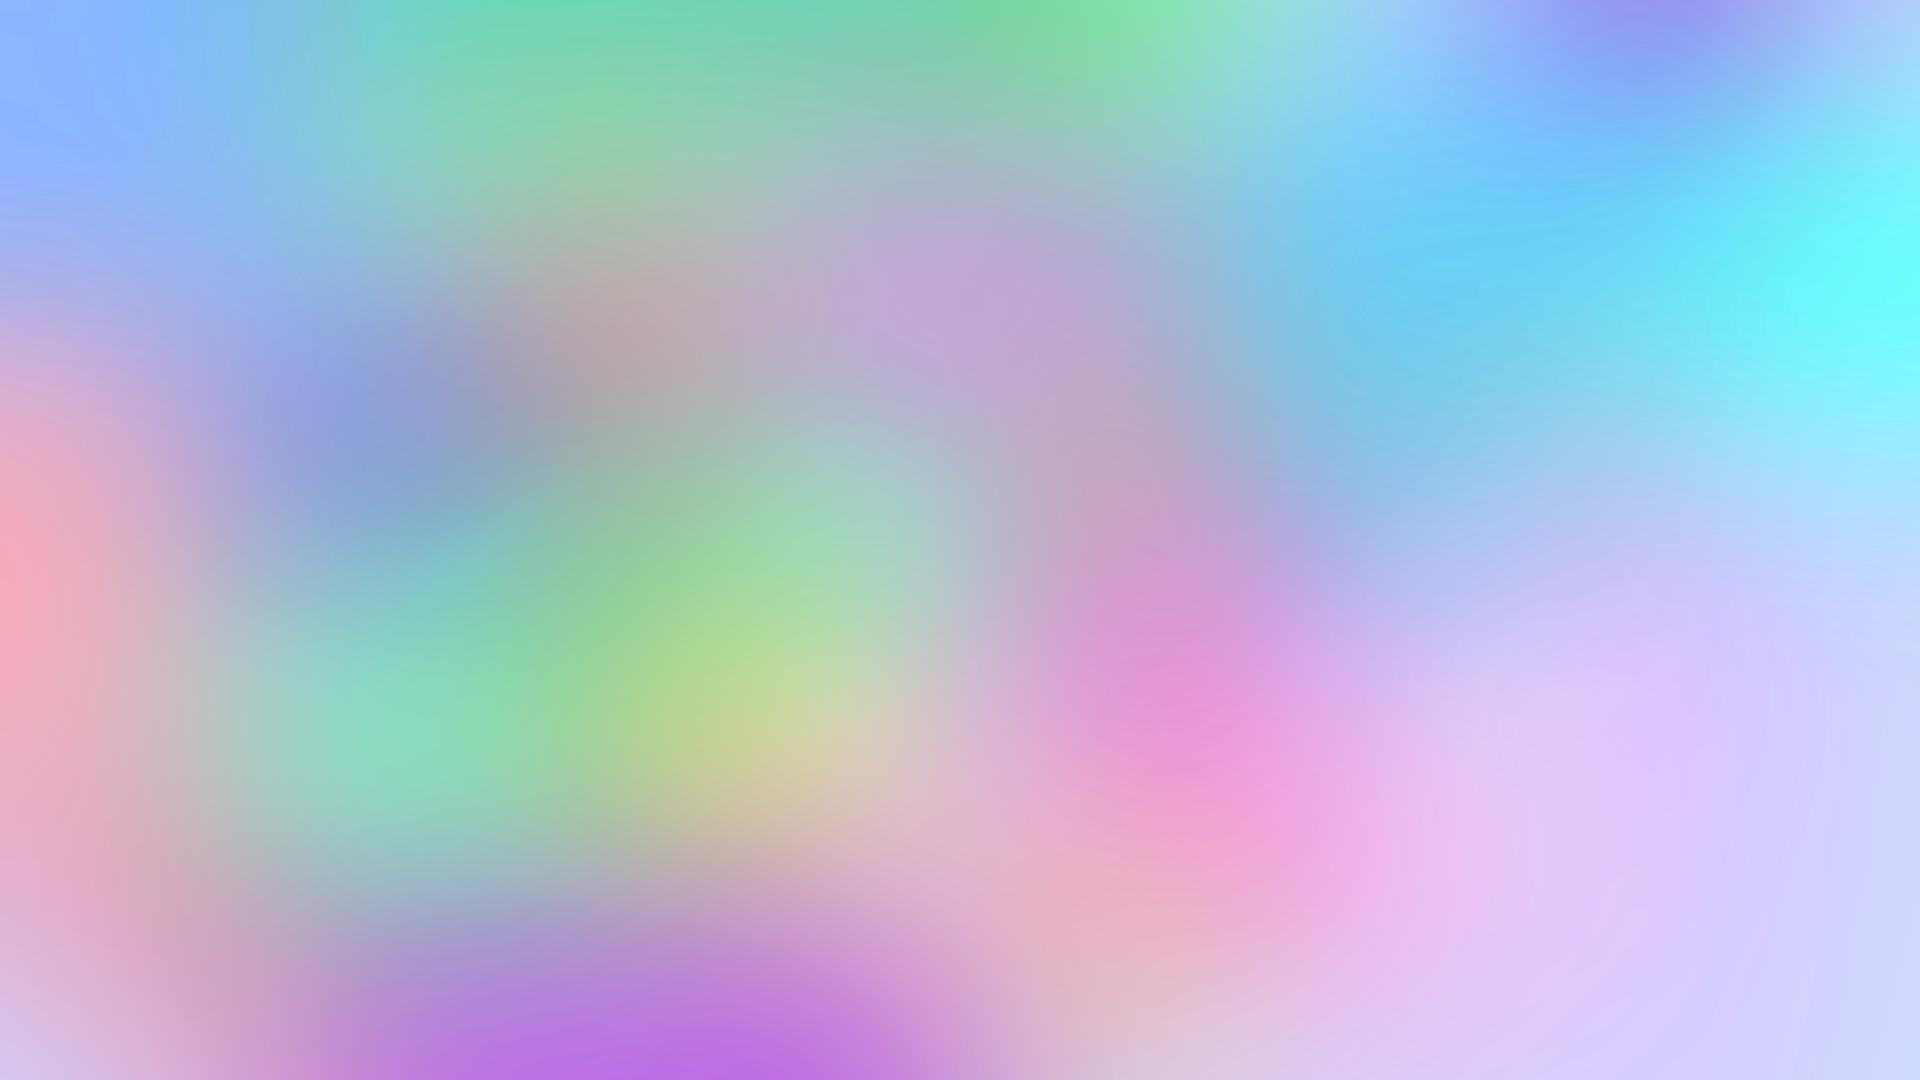 wallpaper pastel sonyrootkit art deviantart 1920x1080